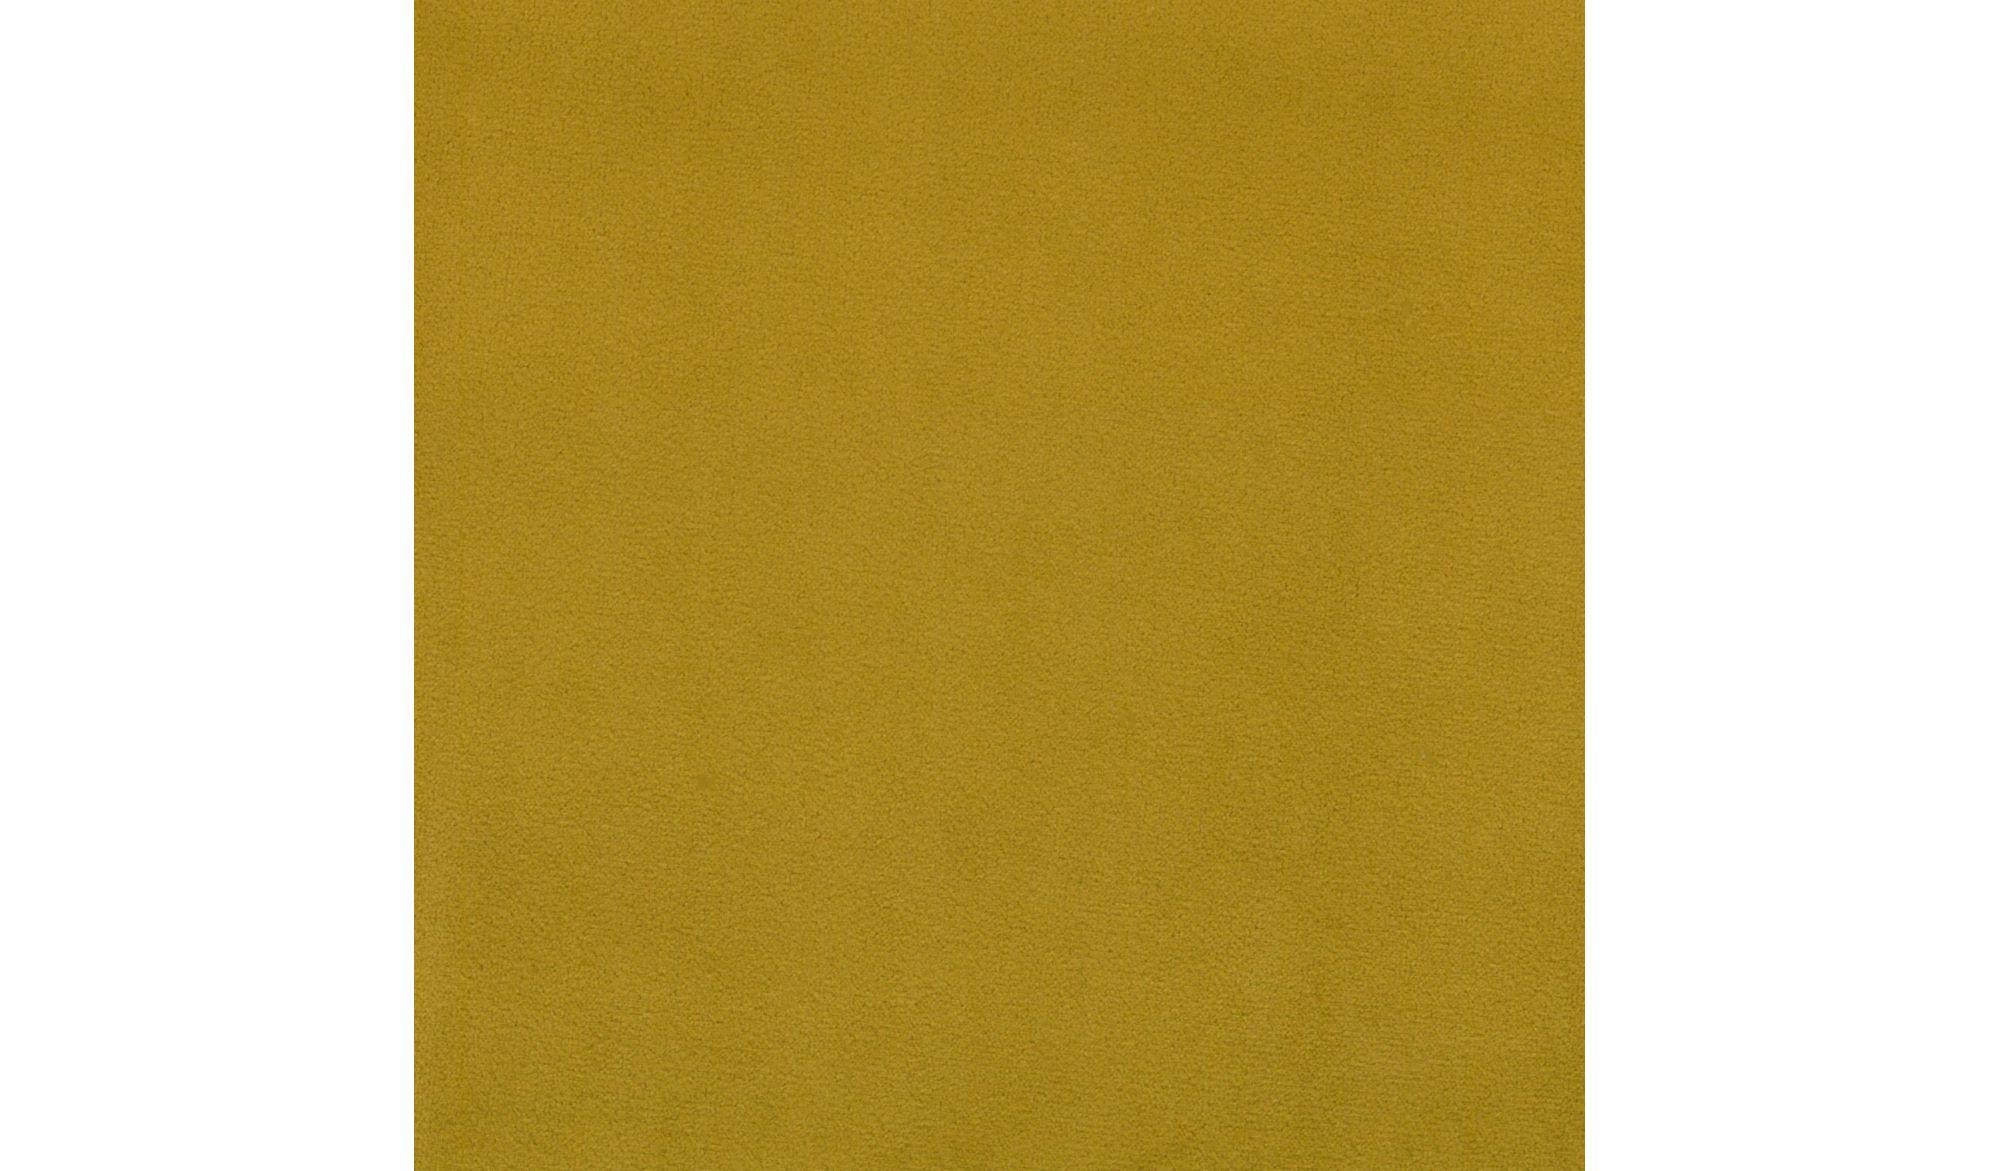 SCOT Olive-30